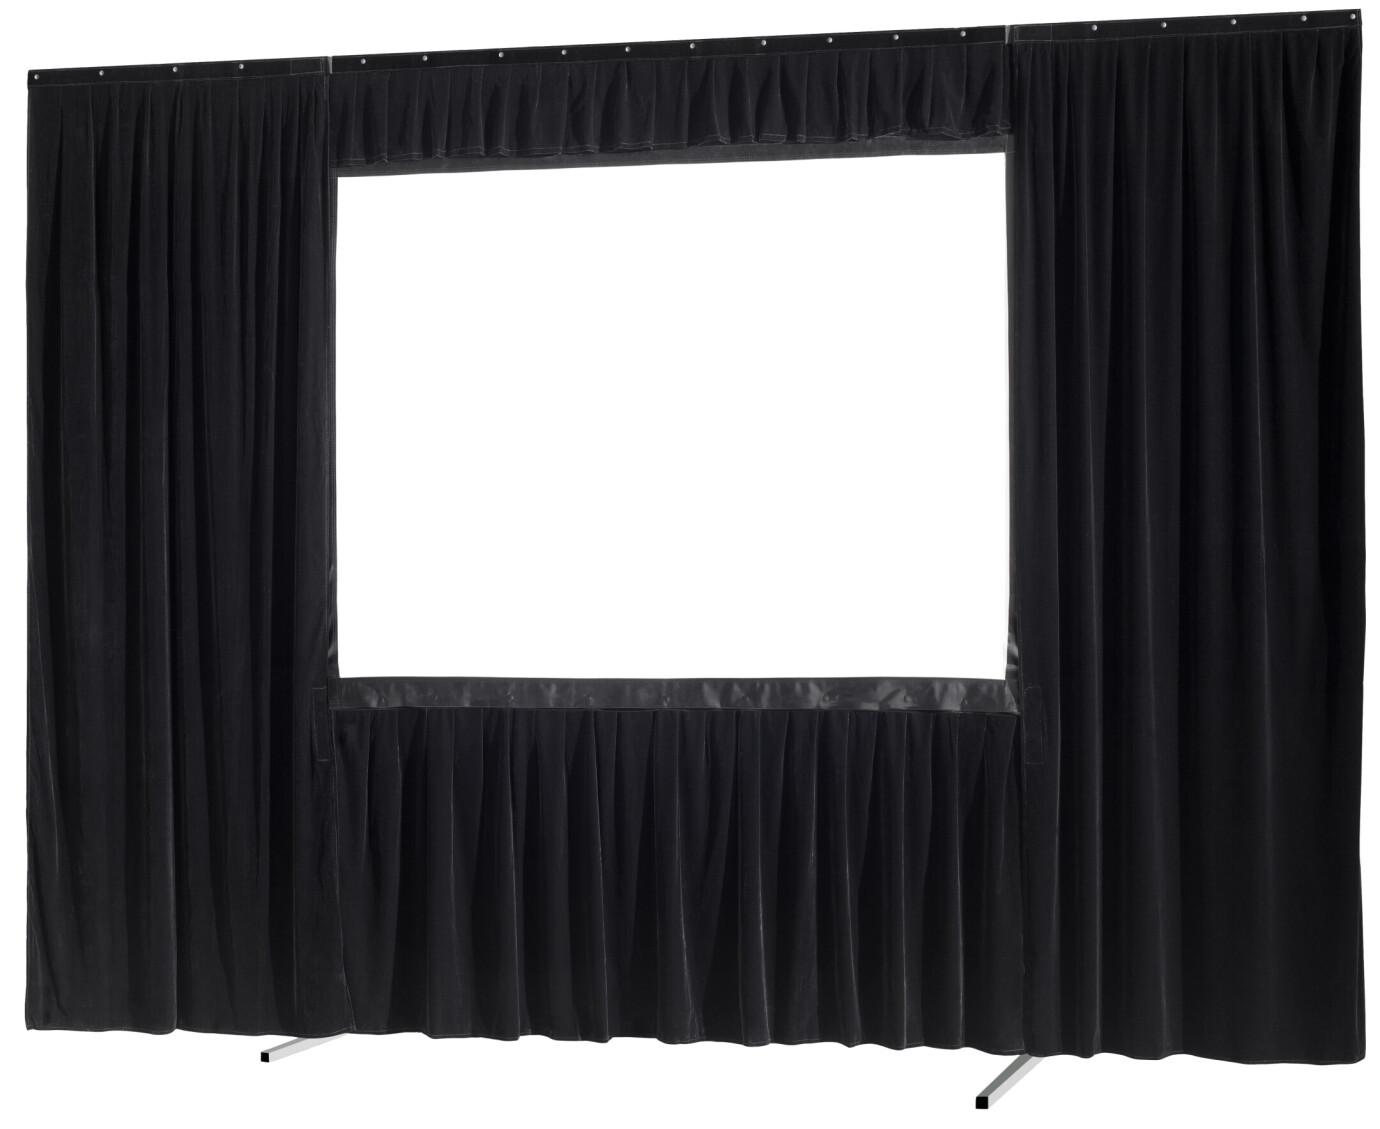 celexon Vorhangset 4-seitig für Faltrahmenleinwand Mobil Expert 366 x 229 cm